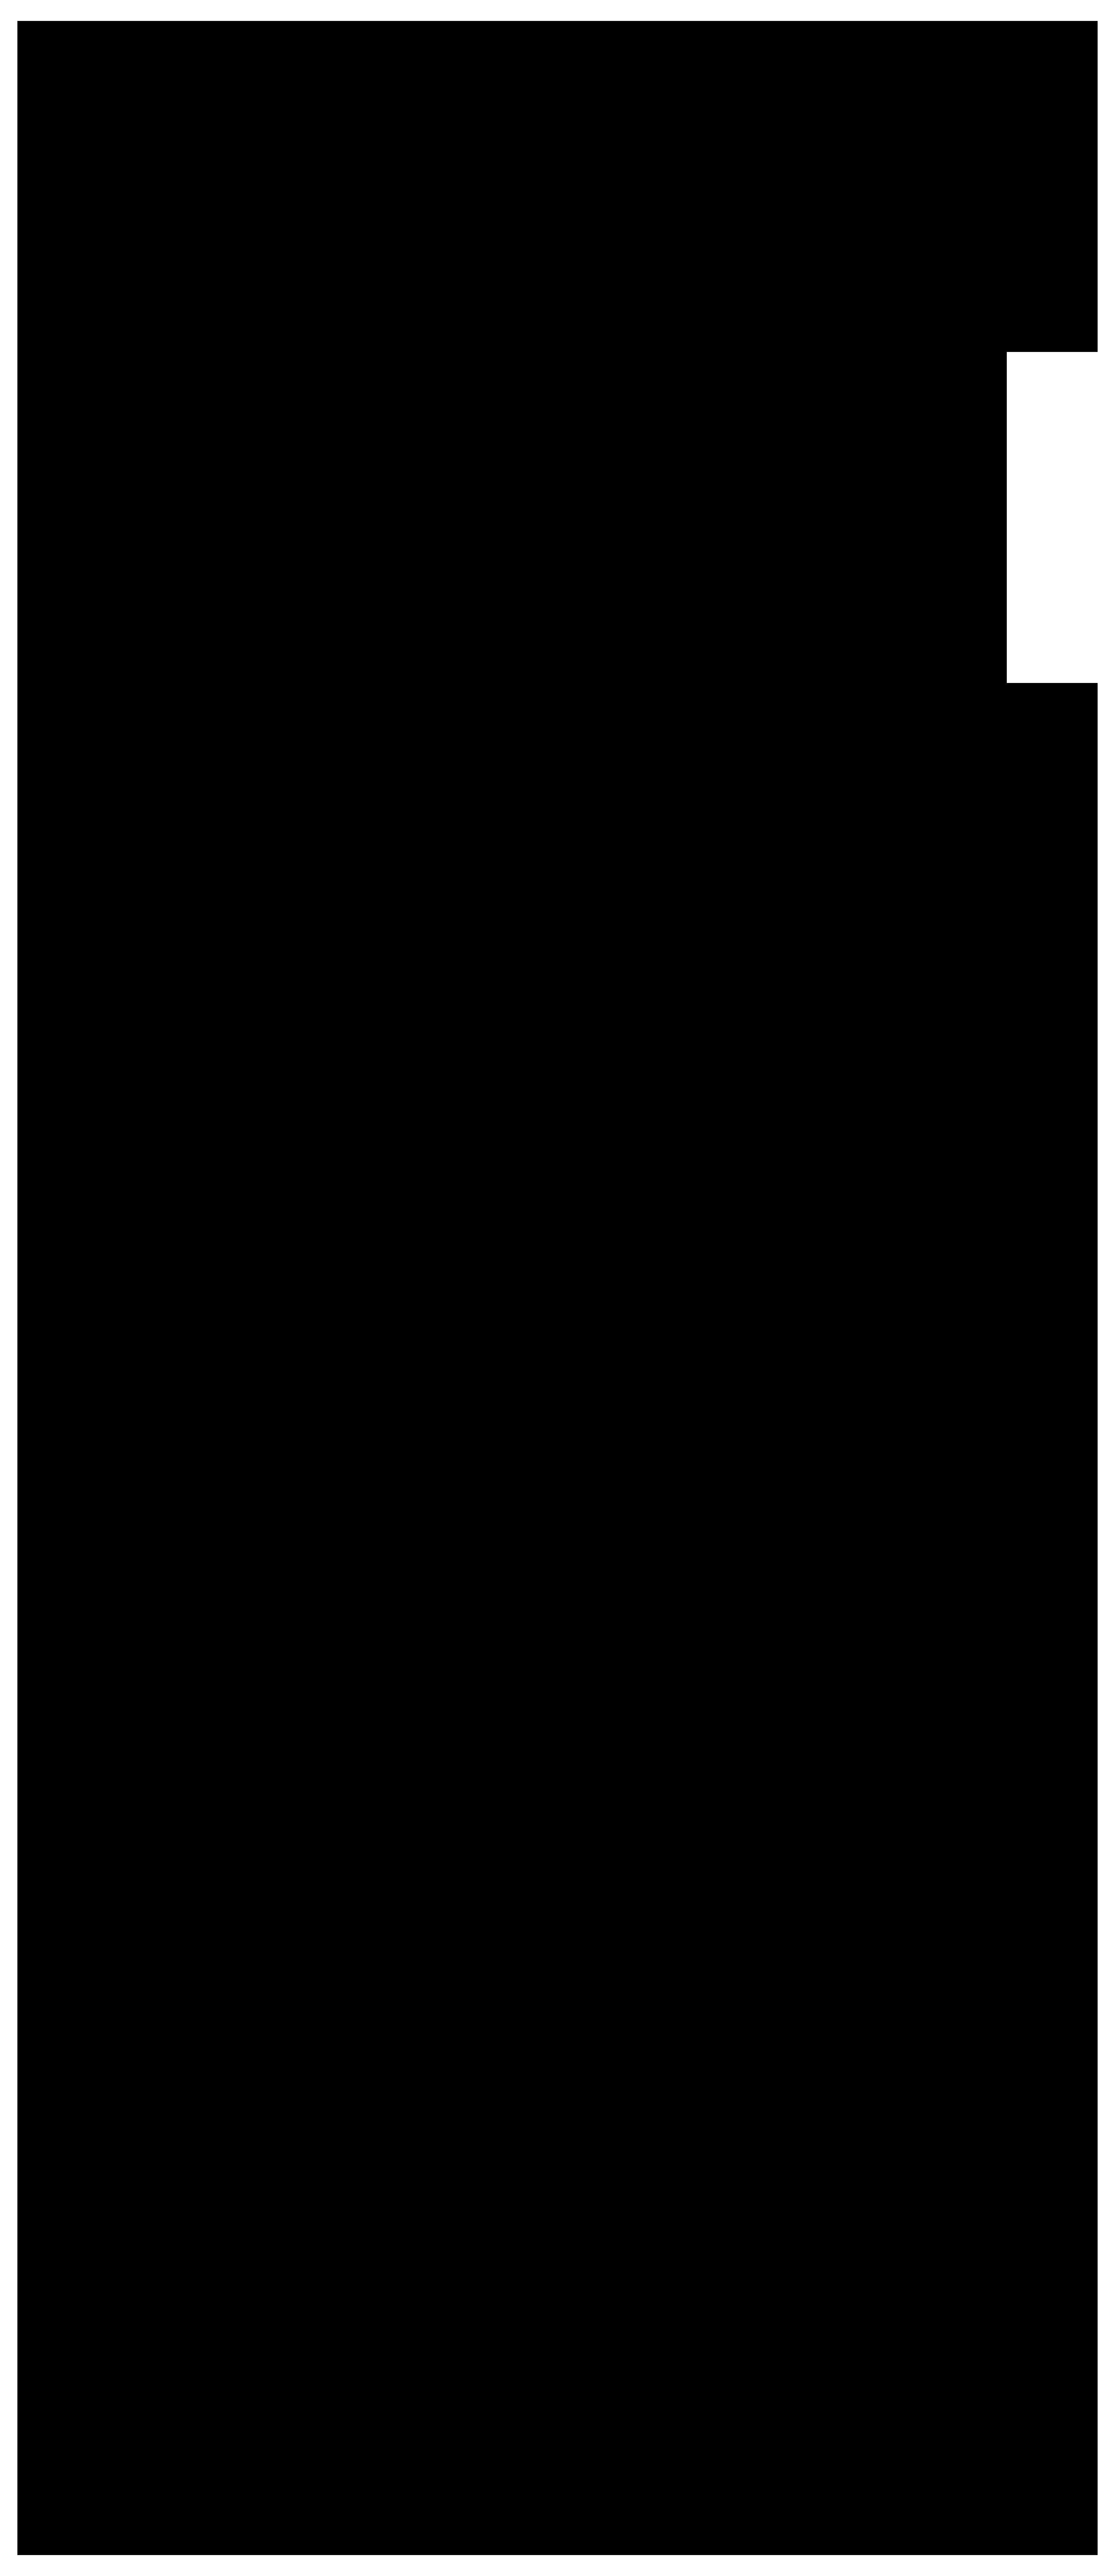 Grim reaper clipart. Silhouette png clip art